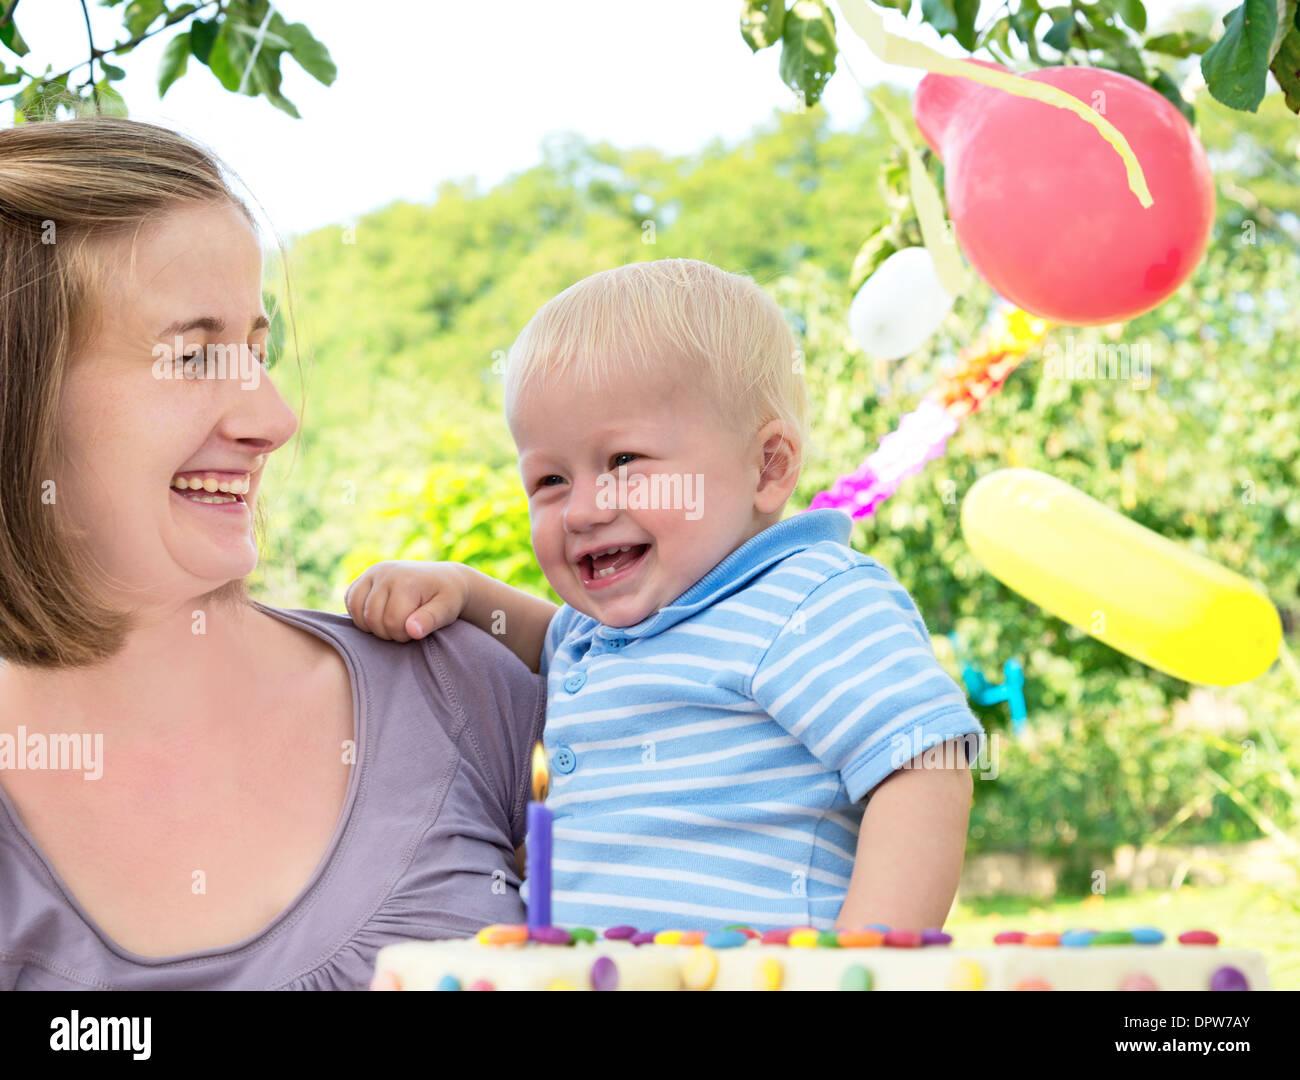 young family celebrates birthday - Stock Image